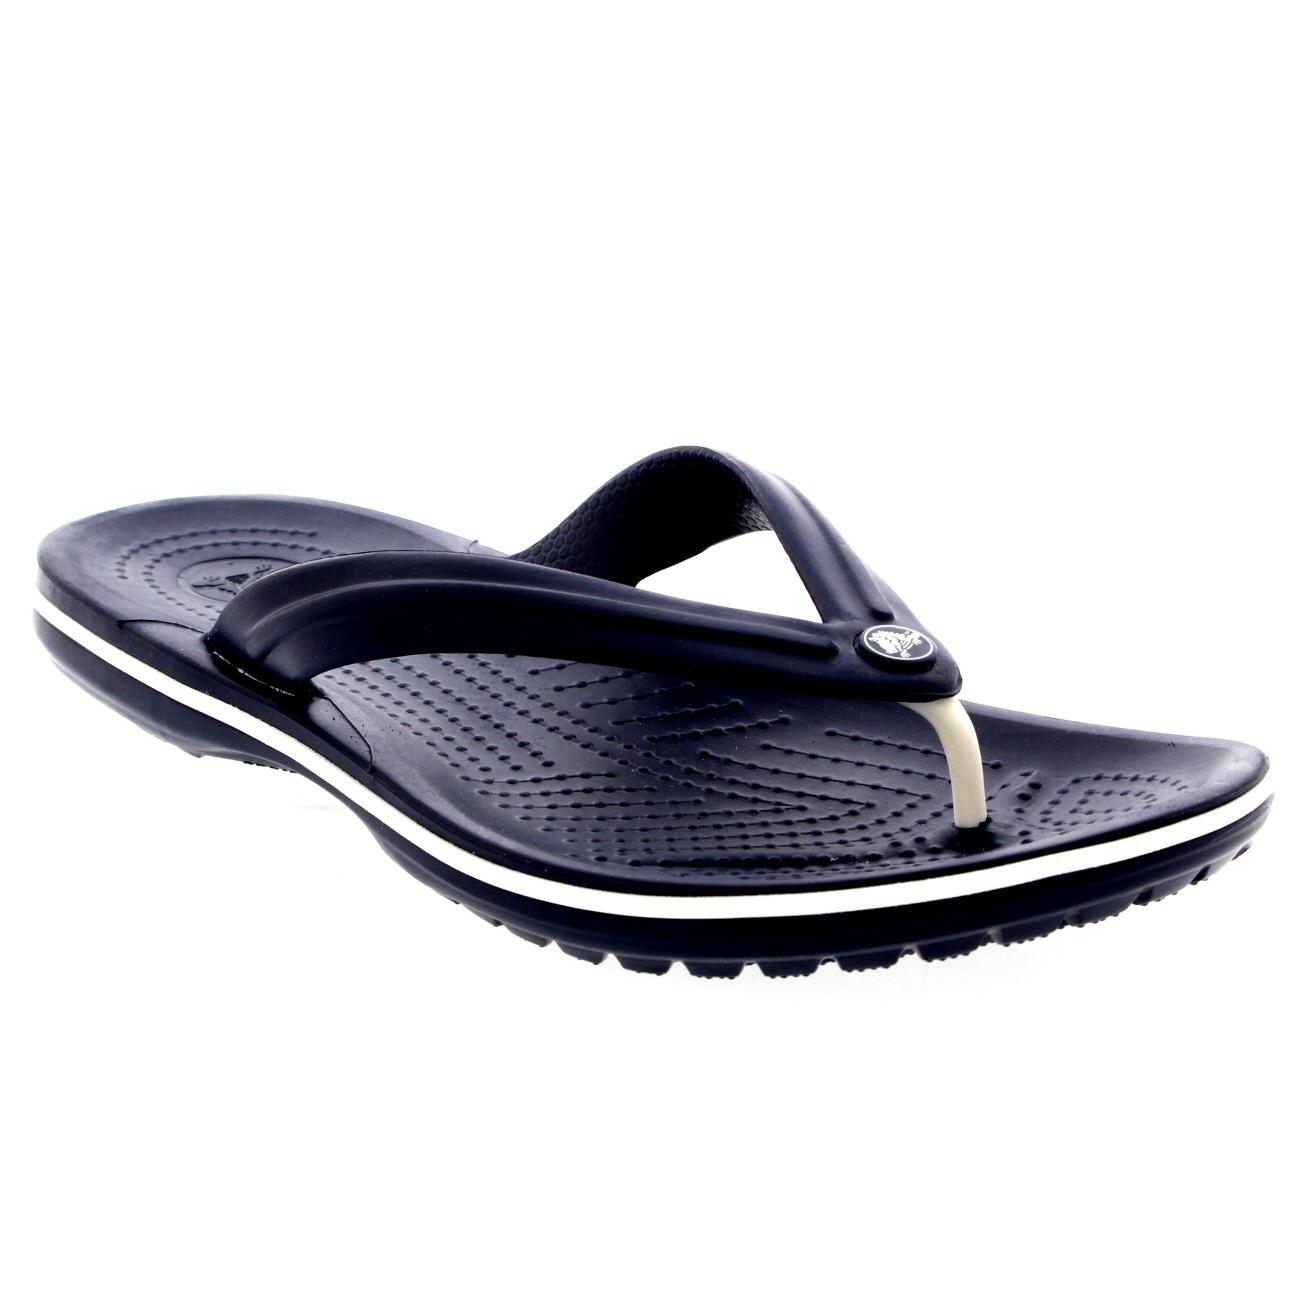 Unisex Adults Crocs Crocband Flip